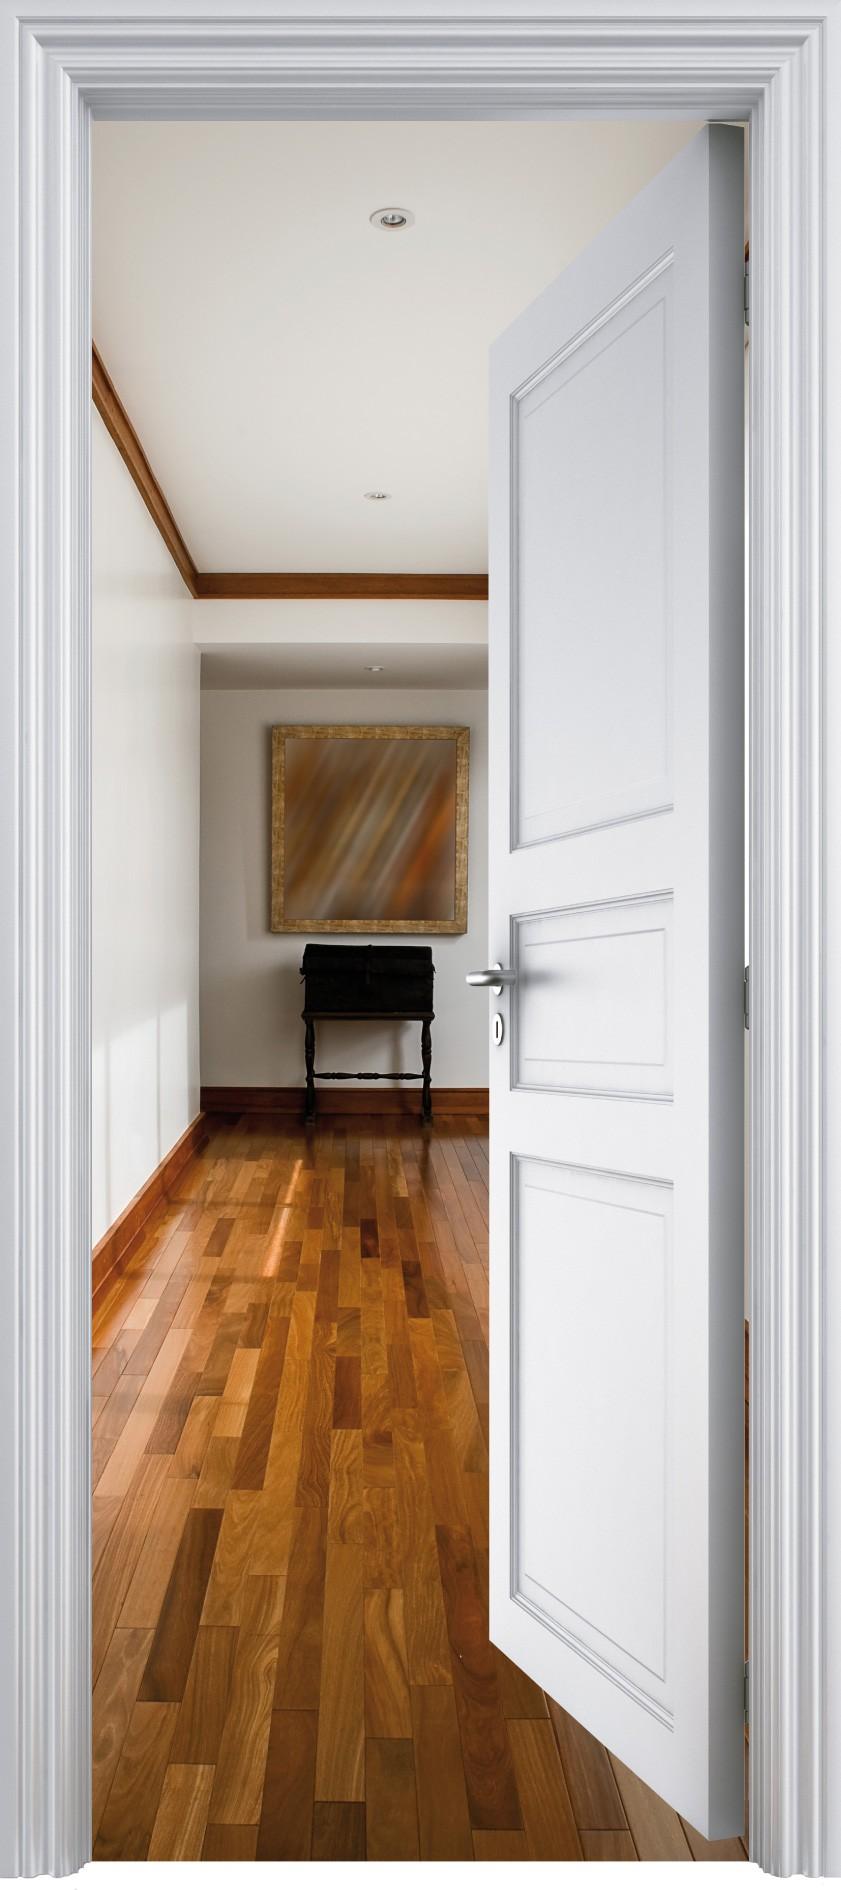 trompe l oeil porte fashion designs. Black Bedroom Furniture Sets. Home Design Ideas